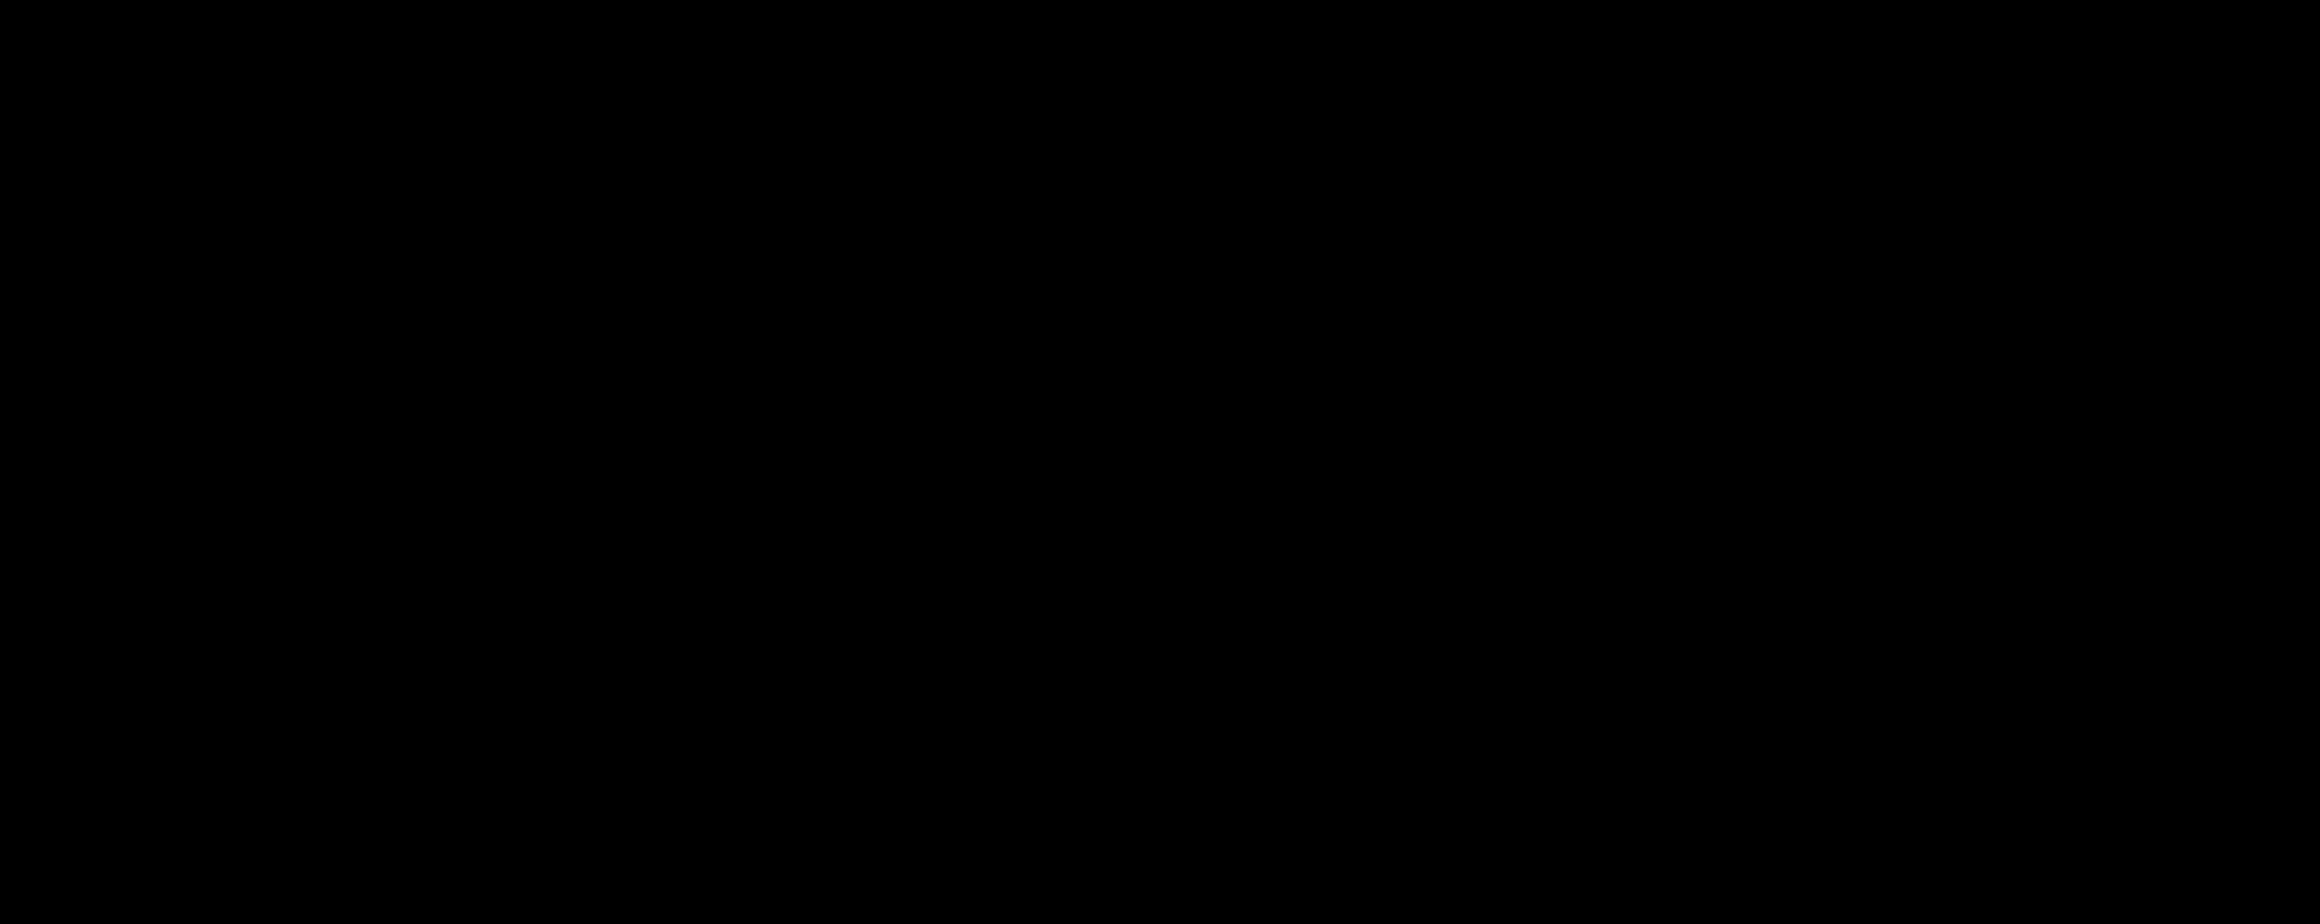 11-(Dansylamino)undecanoic acid